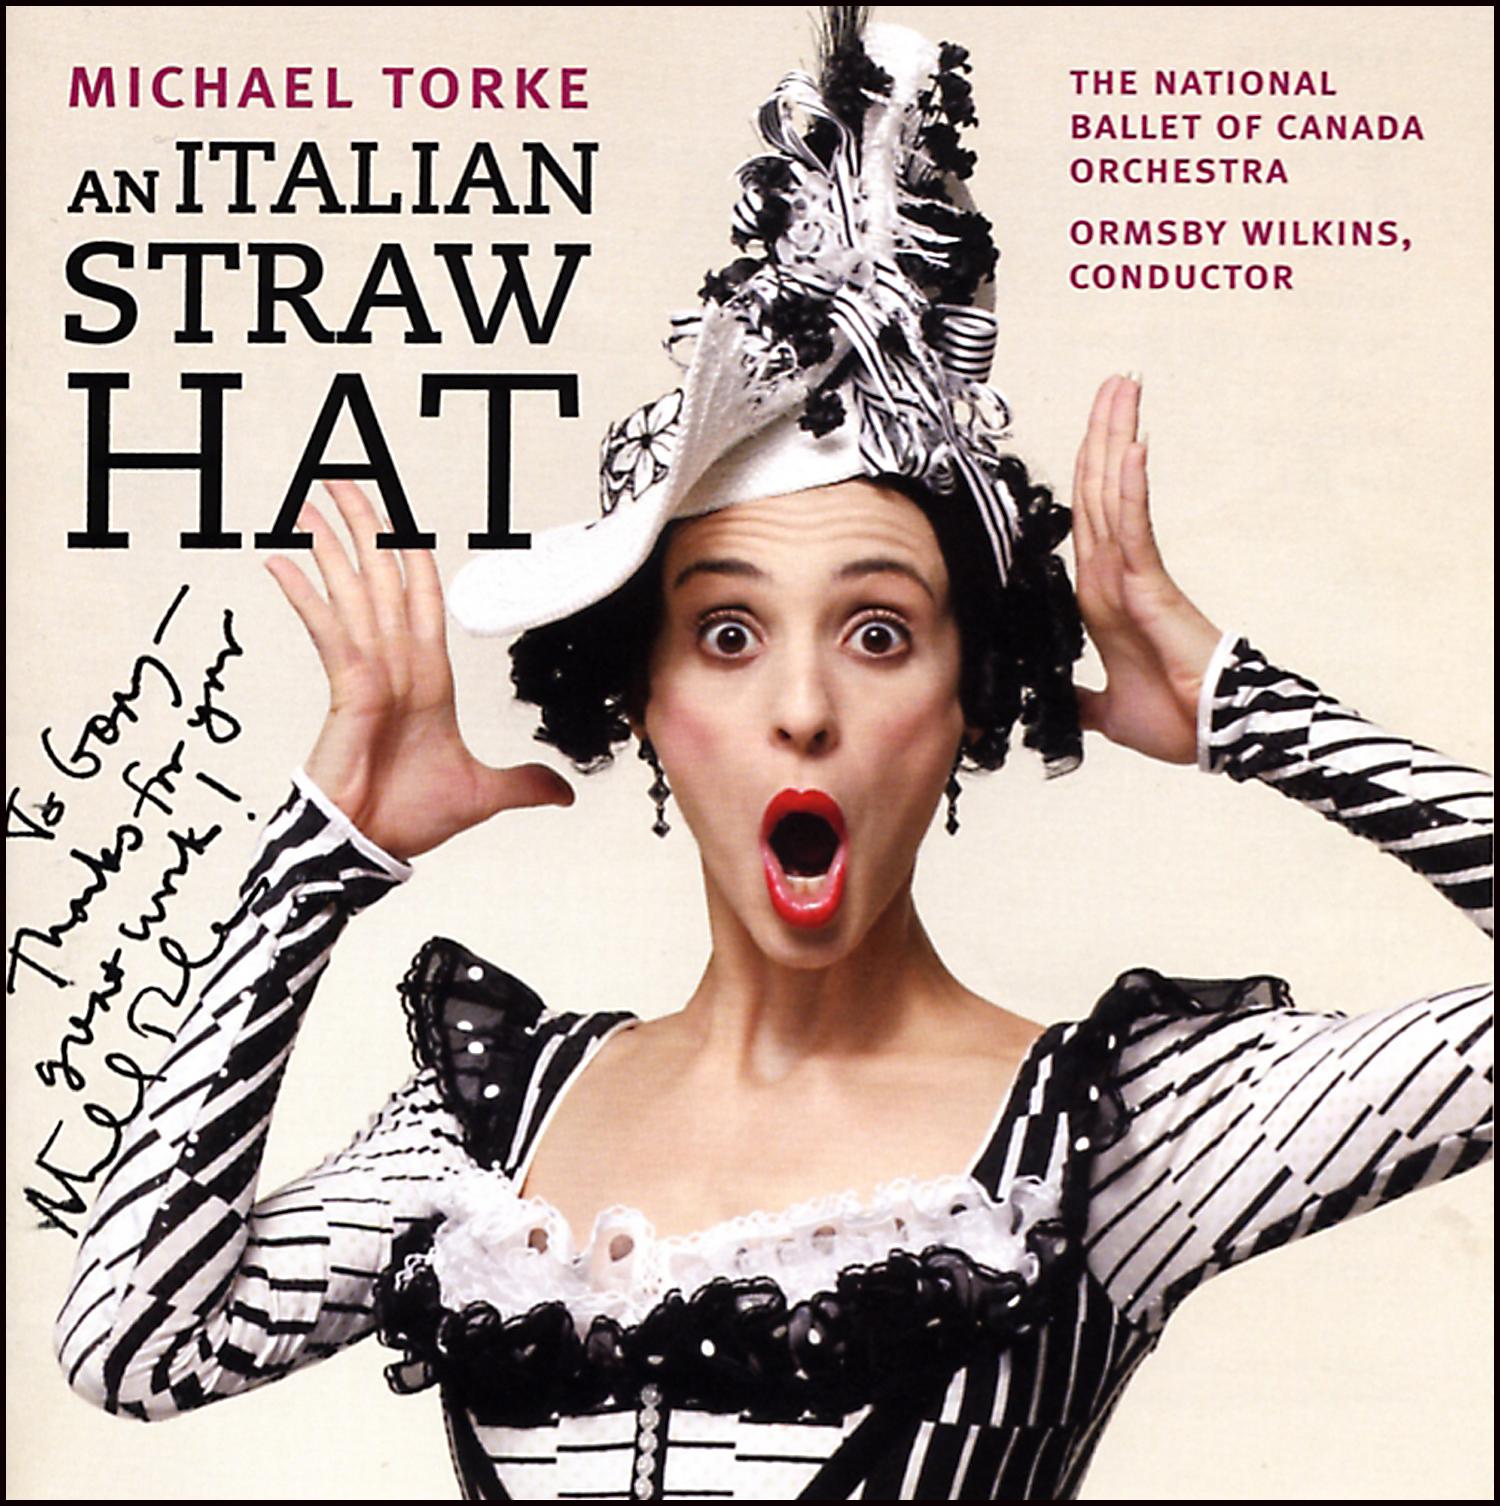 An Italian Straw Hat